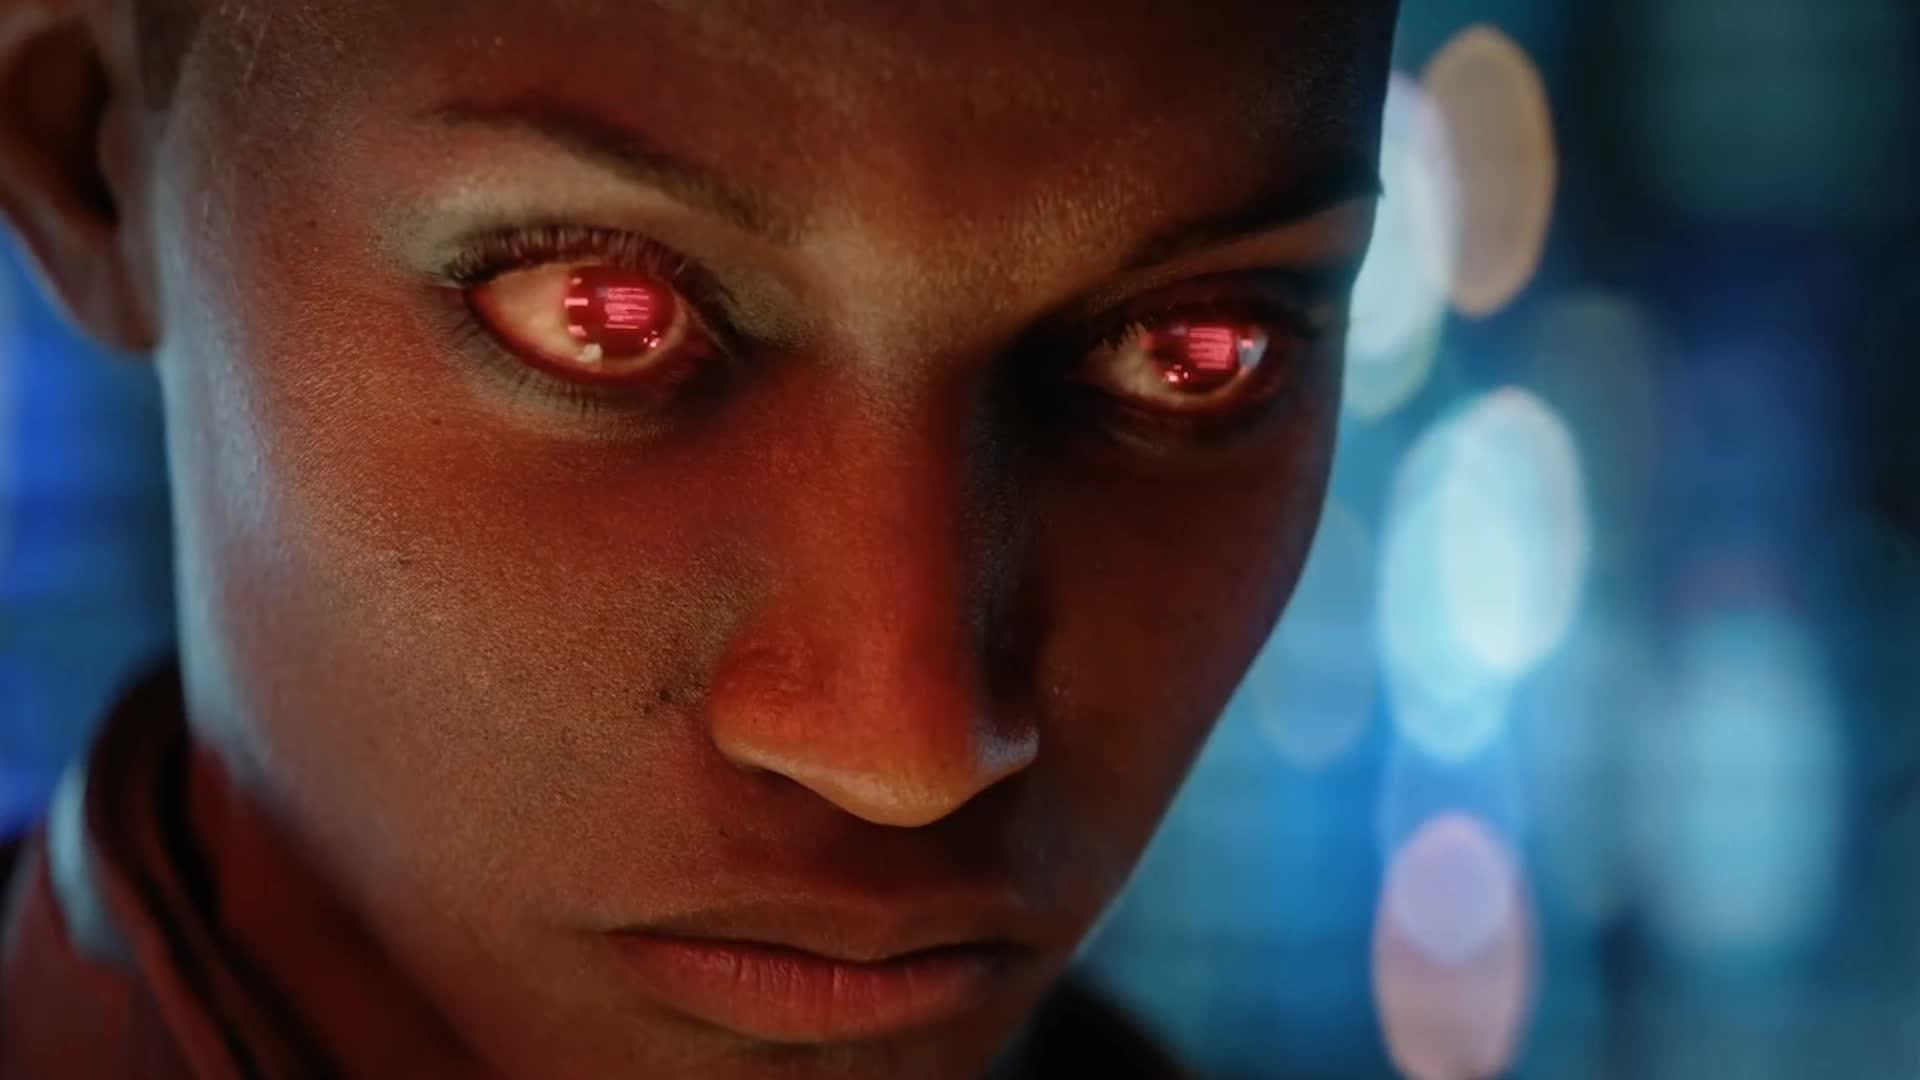 2077, cinematic, cyberpunk, cyberpunk 2077, e3, t-bug, trailer, T-Bug Hacking Eyes | Cyberpunk 2077 GIFs